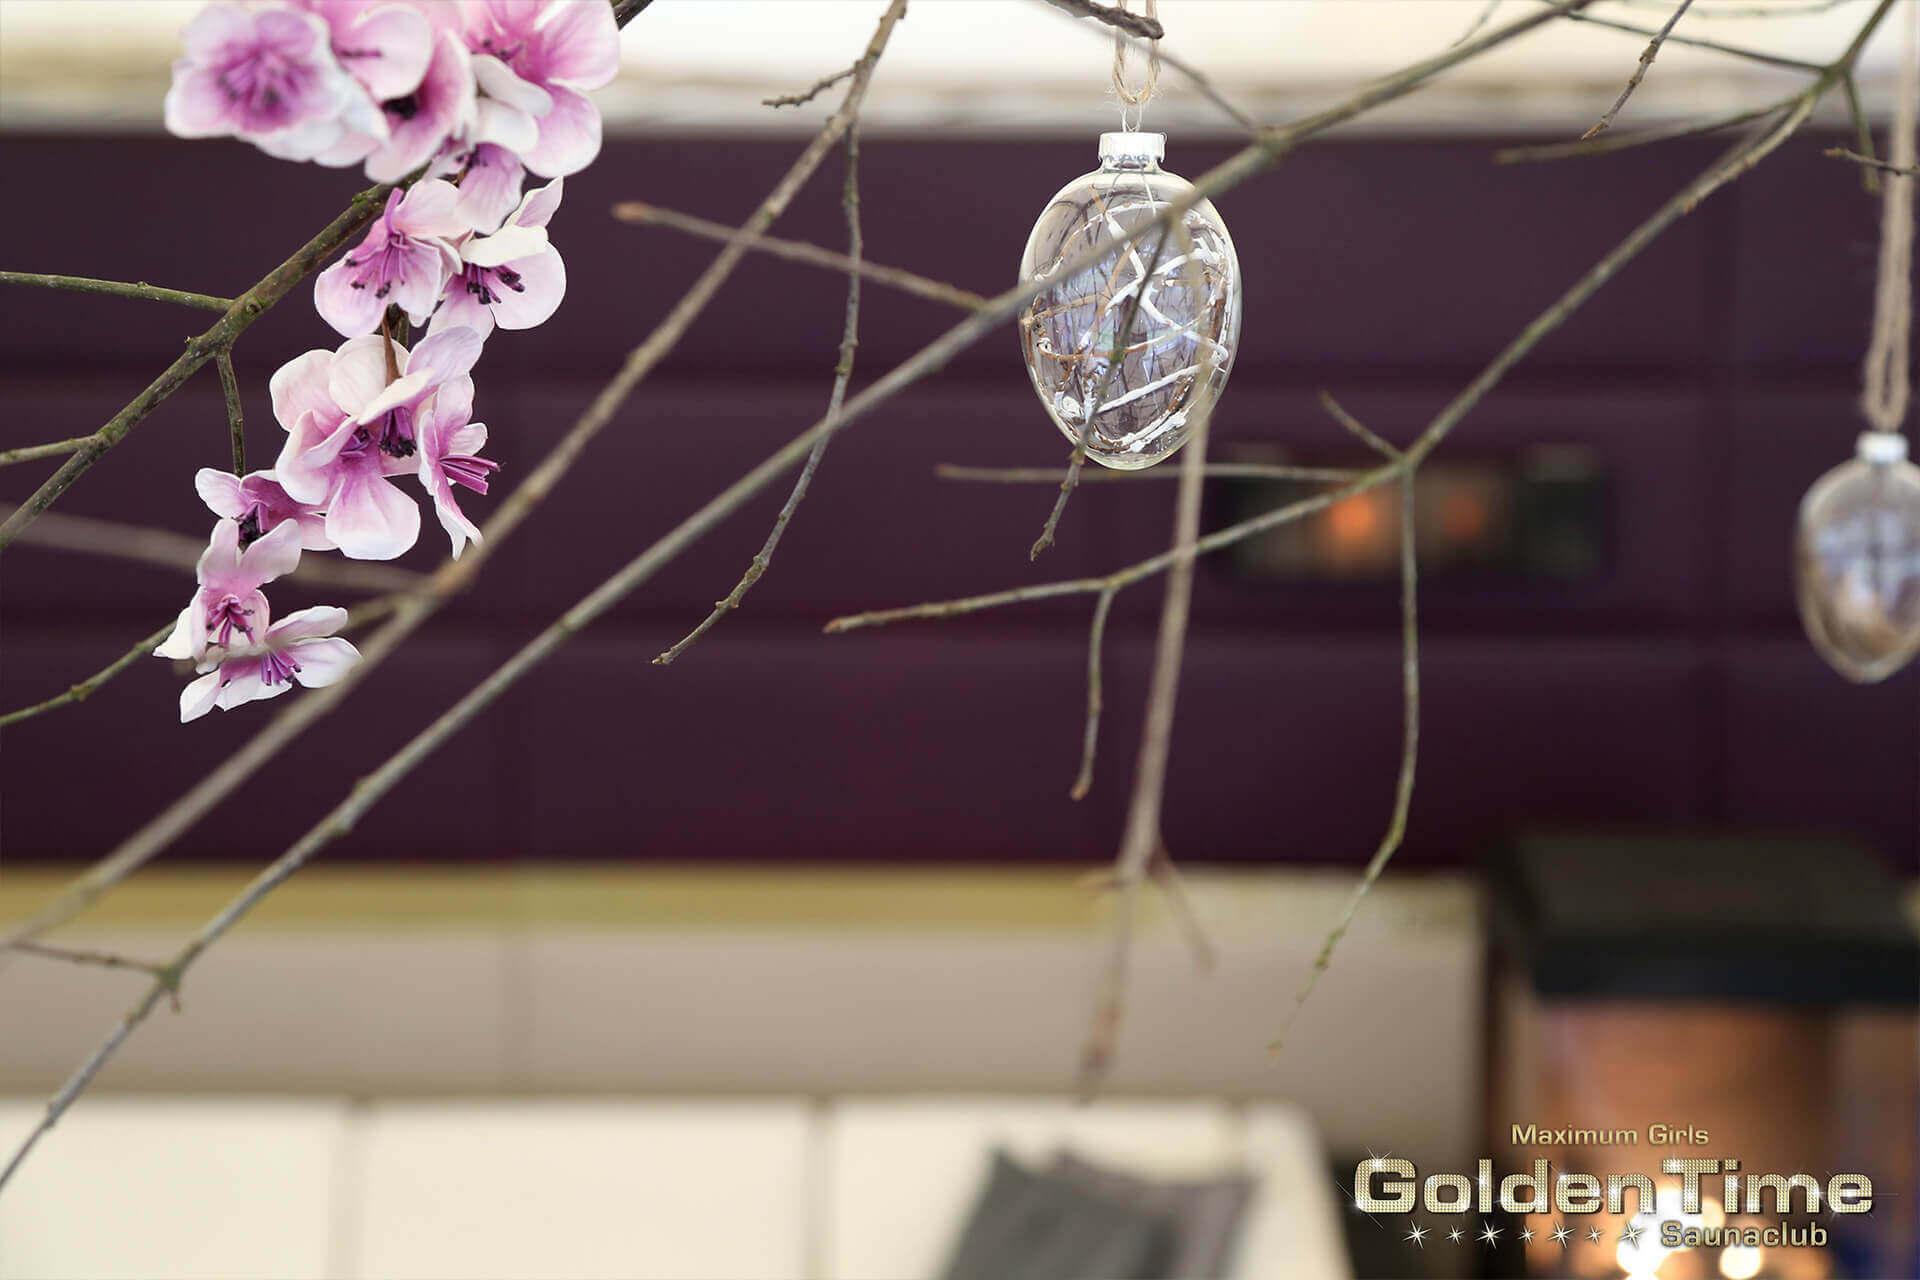 02-ostern-2016-pic-19-goldentime-saunaclub.jpg